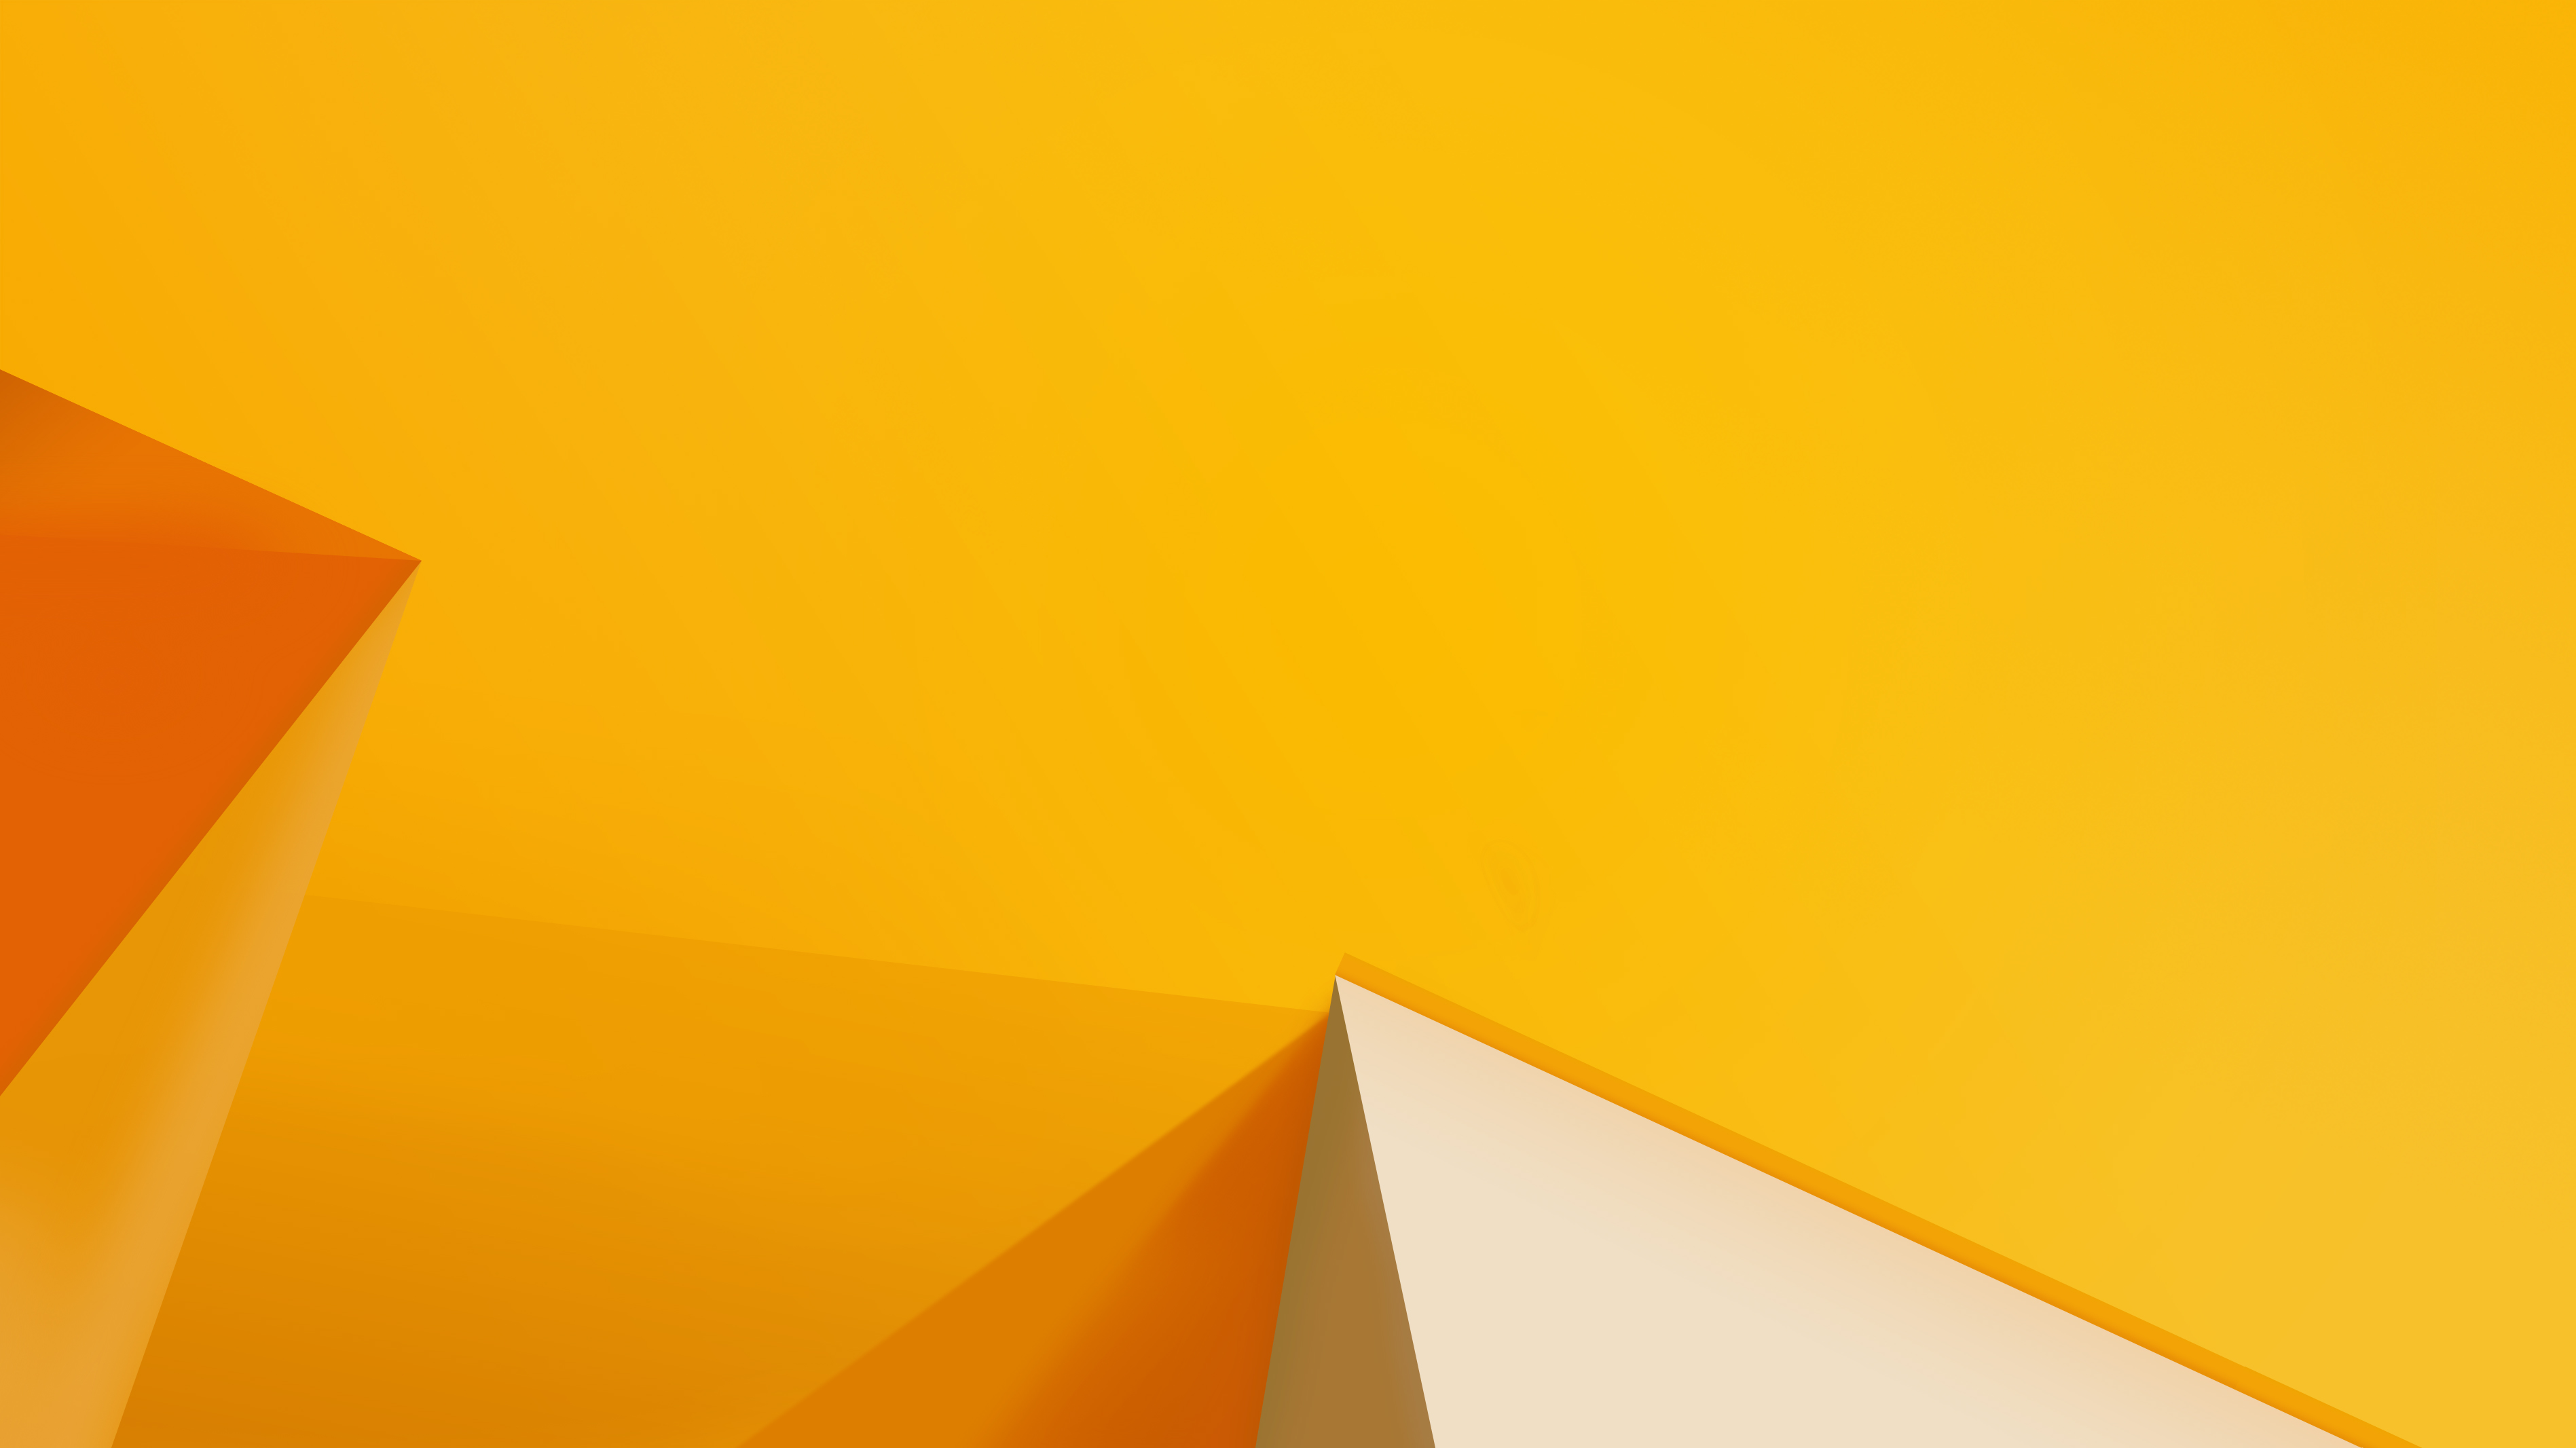 34+] Windows 8.1 Original Wallpaper on ...